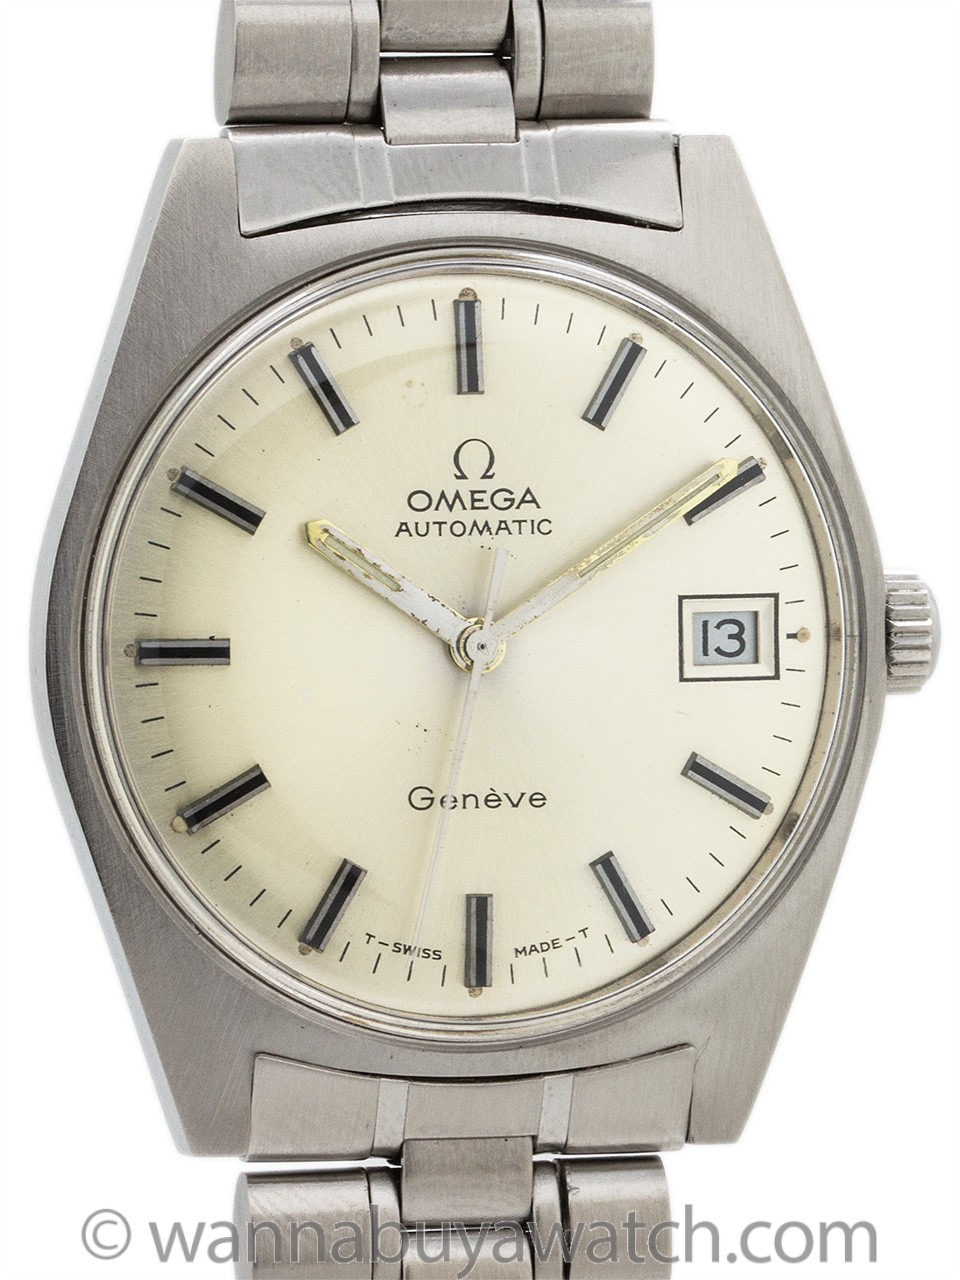 Omega Automatic Geneve ref 166041 circa 1970's